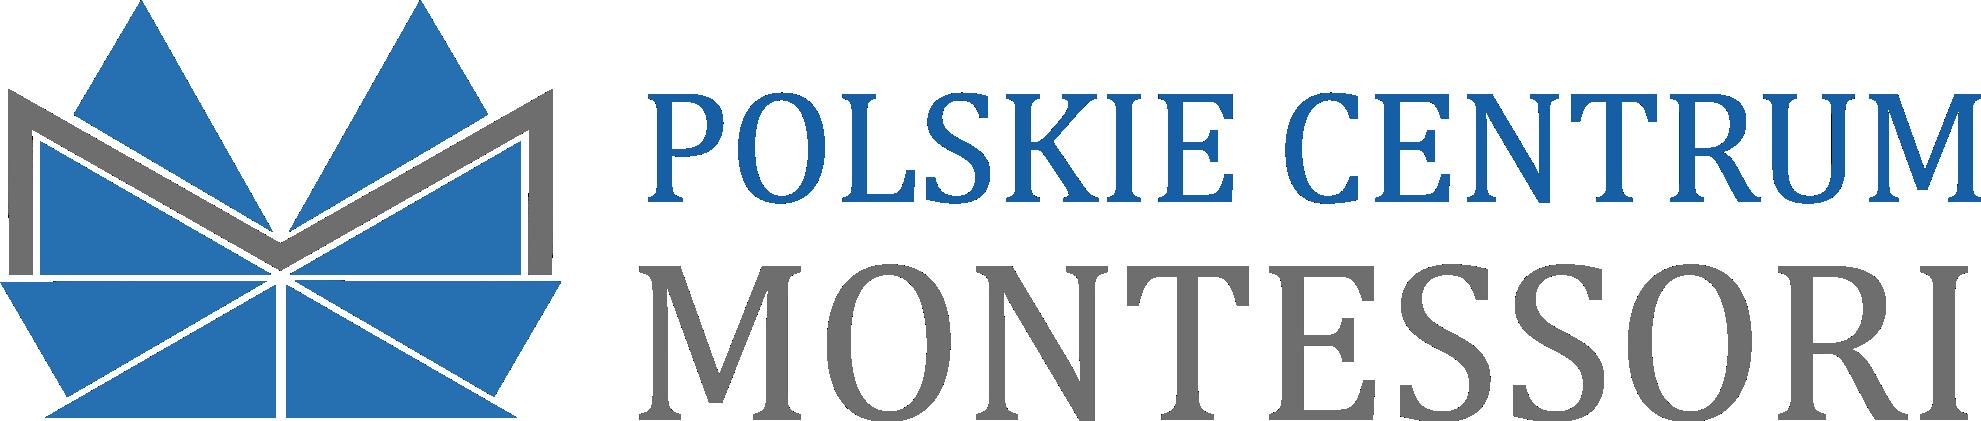 Logo van Polskie Centrum Montessori